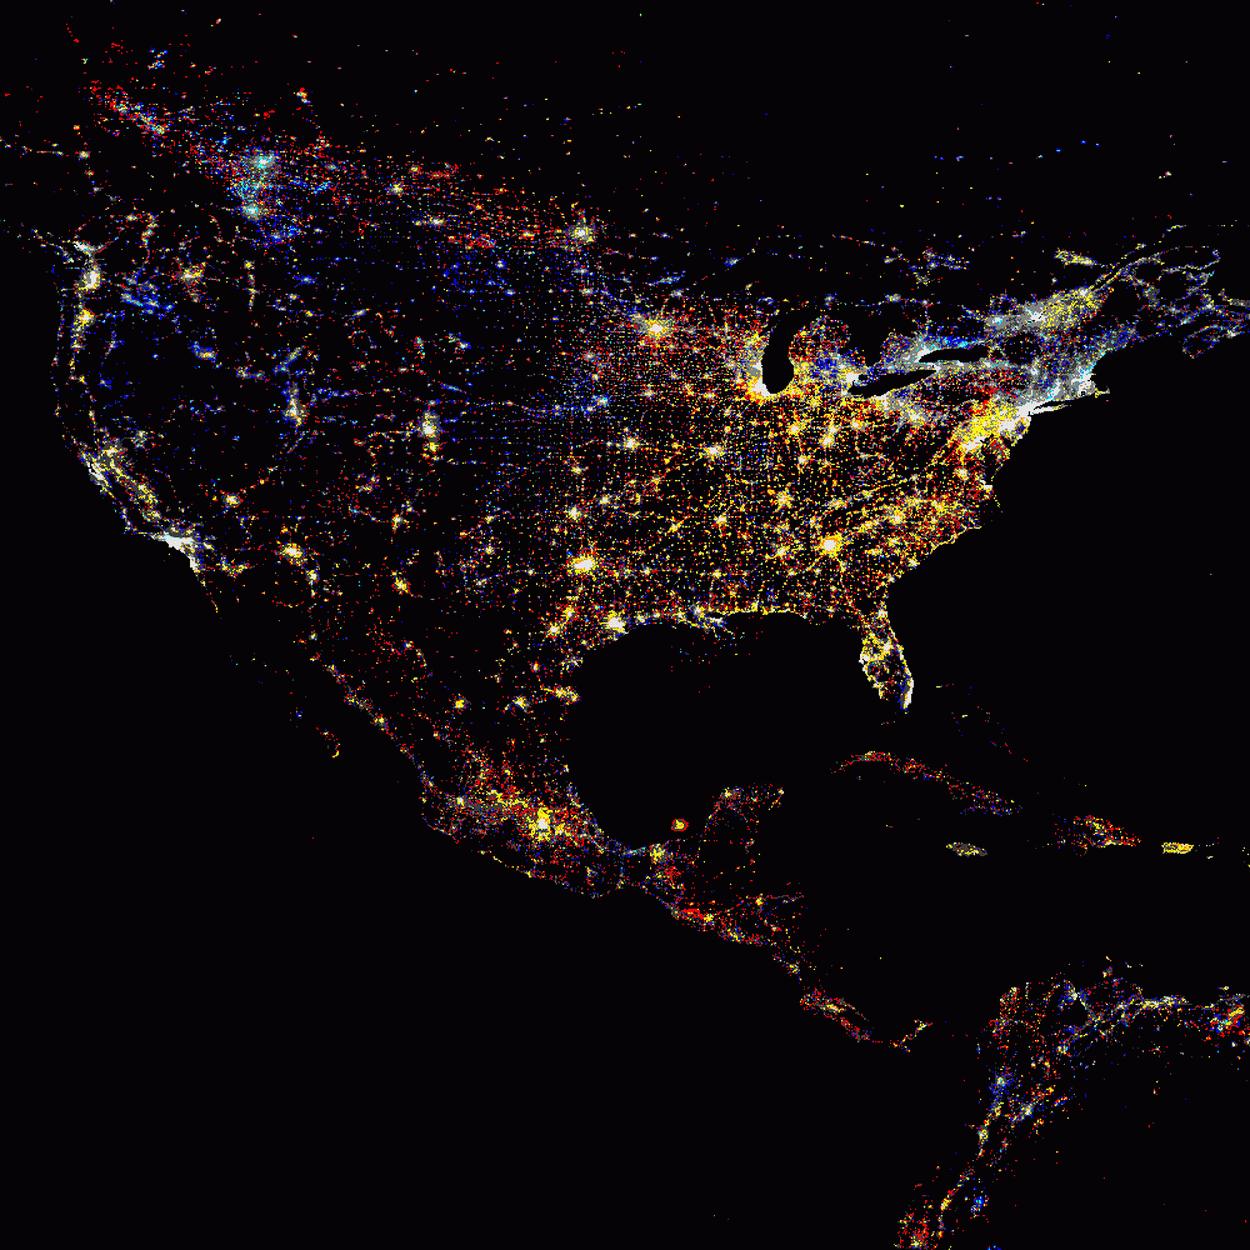 nasa night lights - 670×670